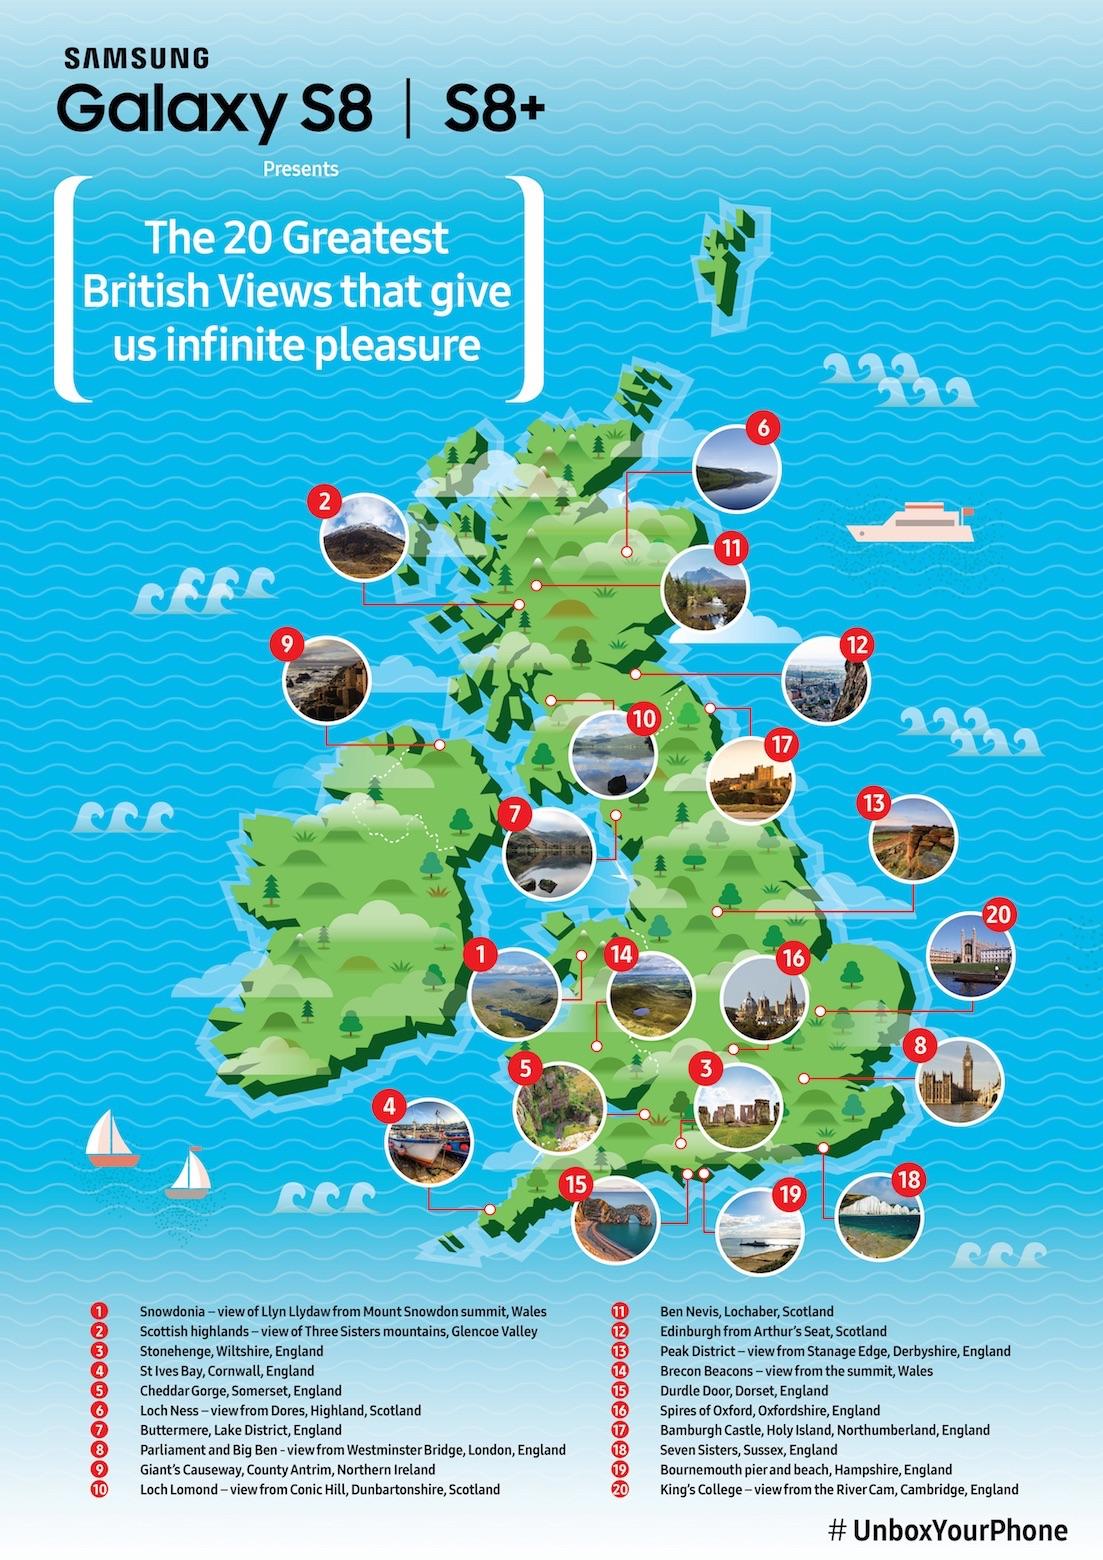 Samsung_Galaxy8_British_Views_Infographic4